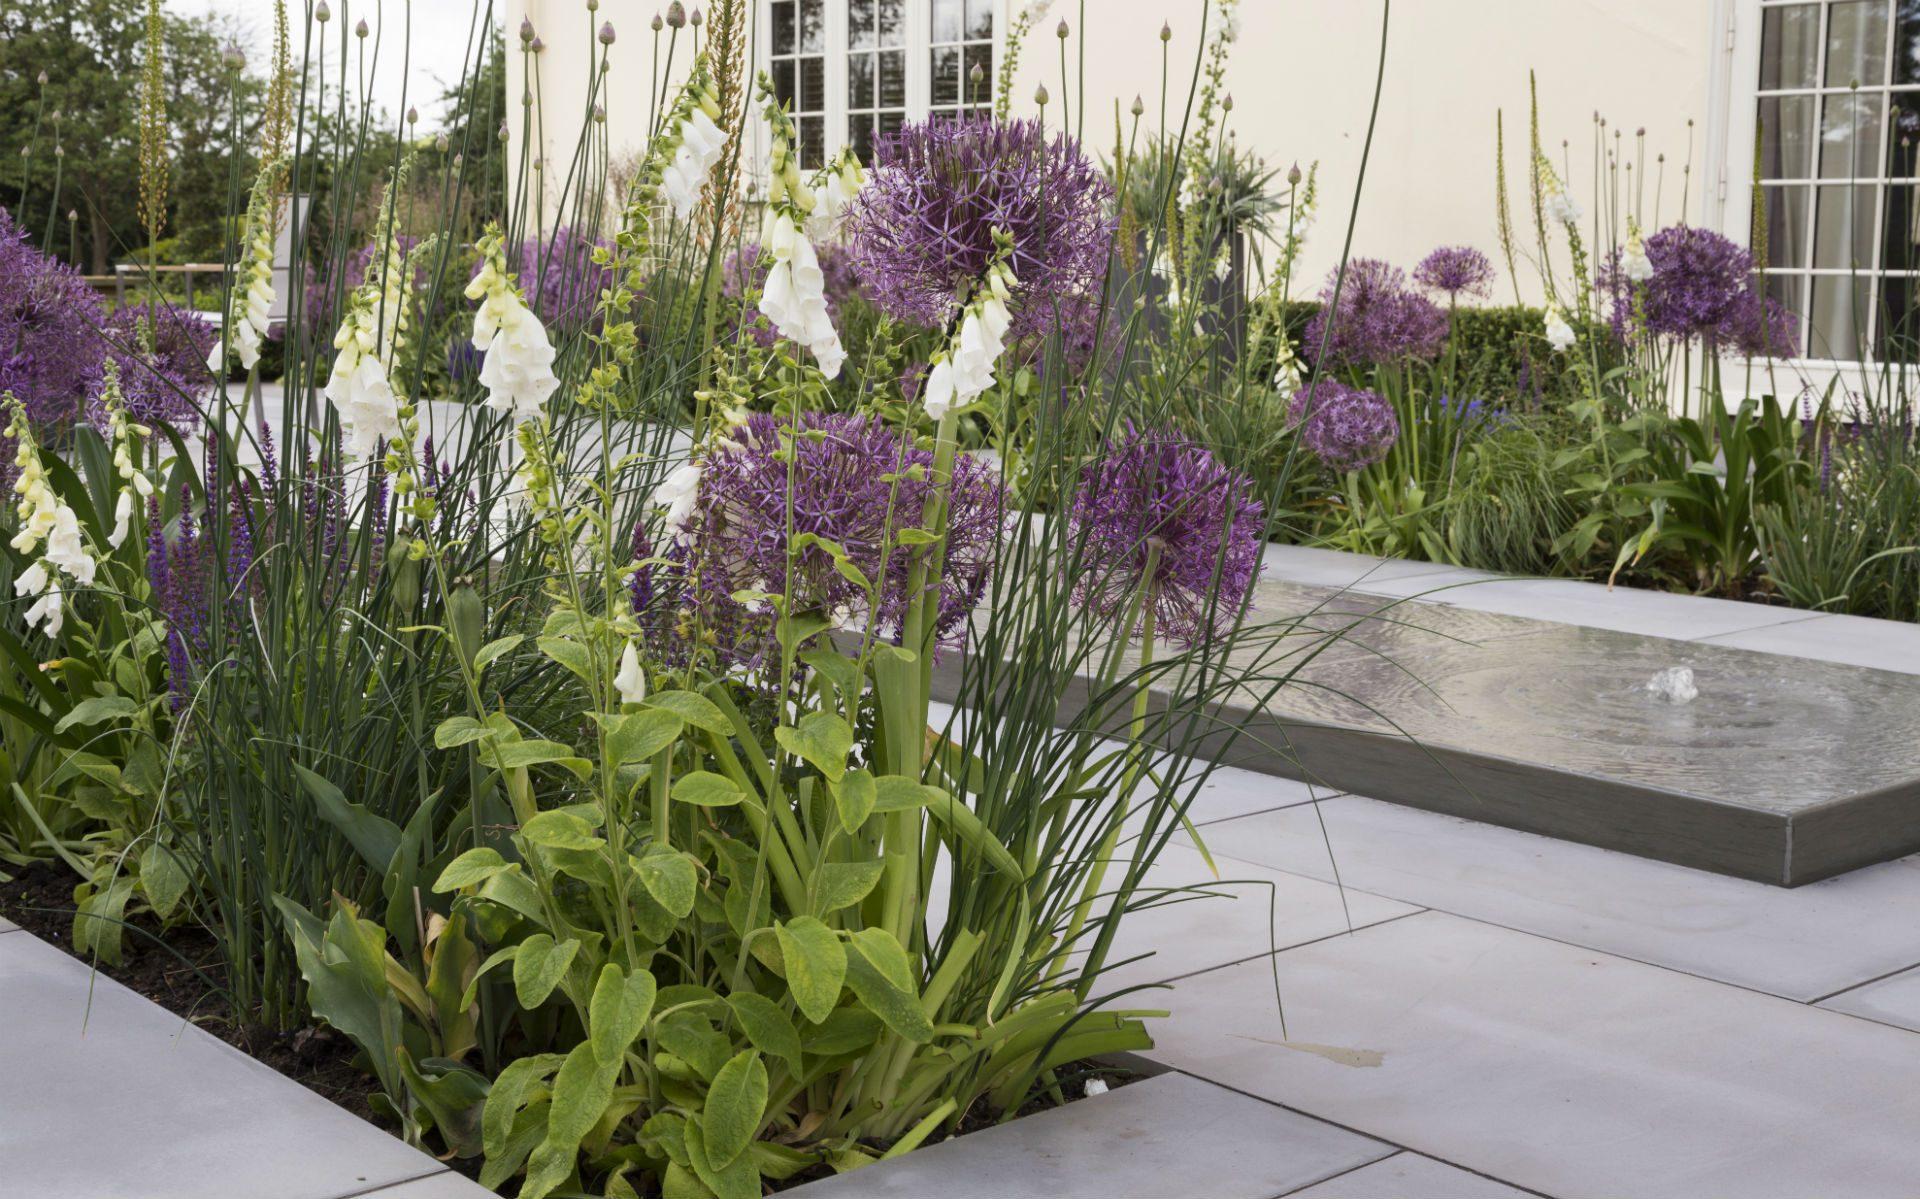 Portfolio Image BALI Award Winning Contemporary Garden Hatfield Peverel Essex